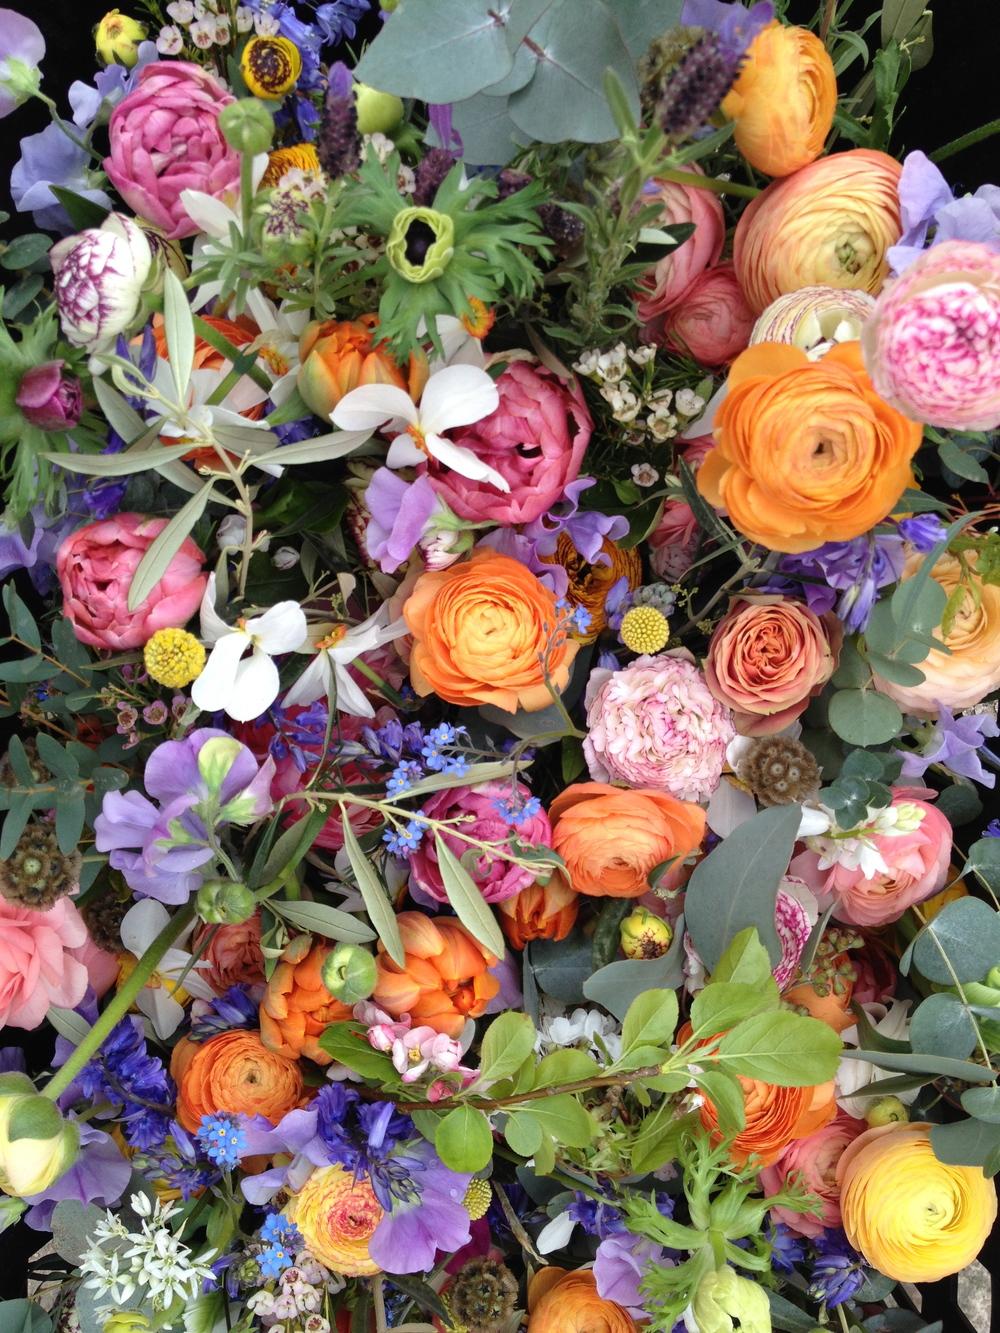 Picotte Ranunculus, Crespida,Eucalyptus,Anemones, Sweet Peas, Lavender, Stellata Ping Pong